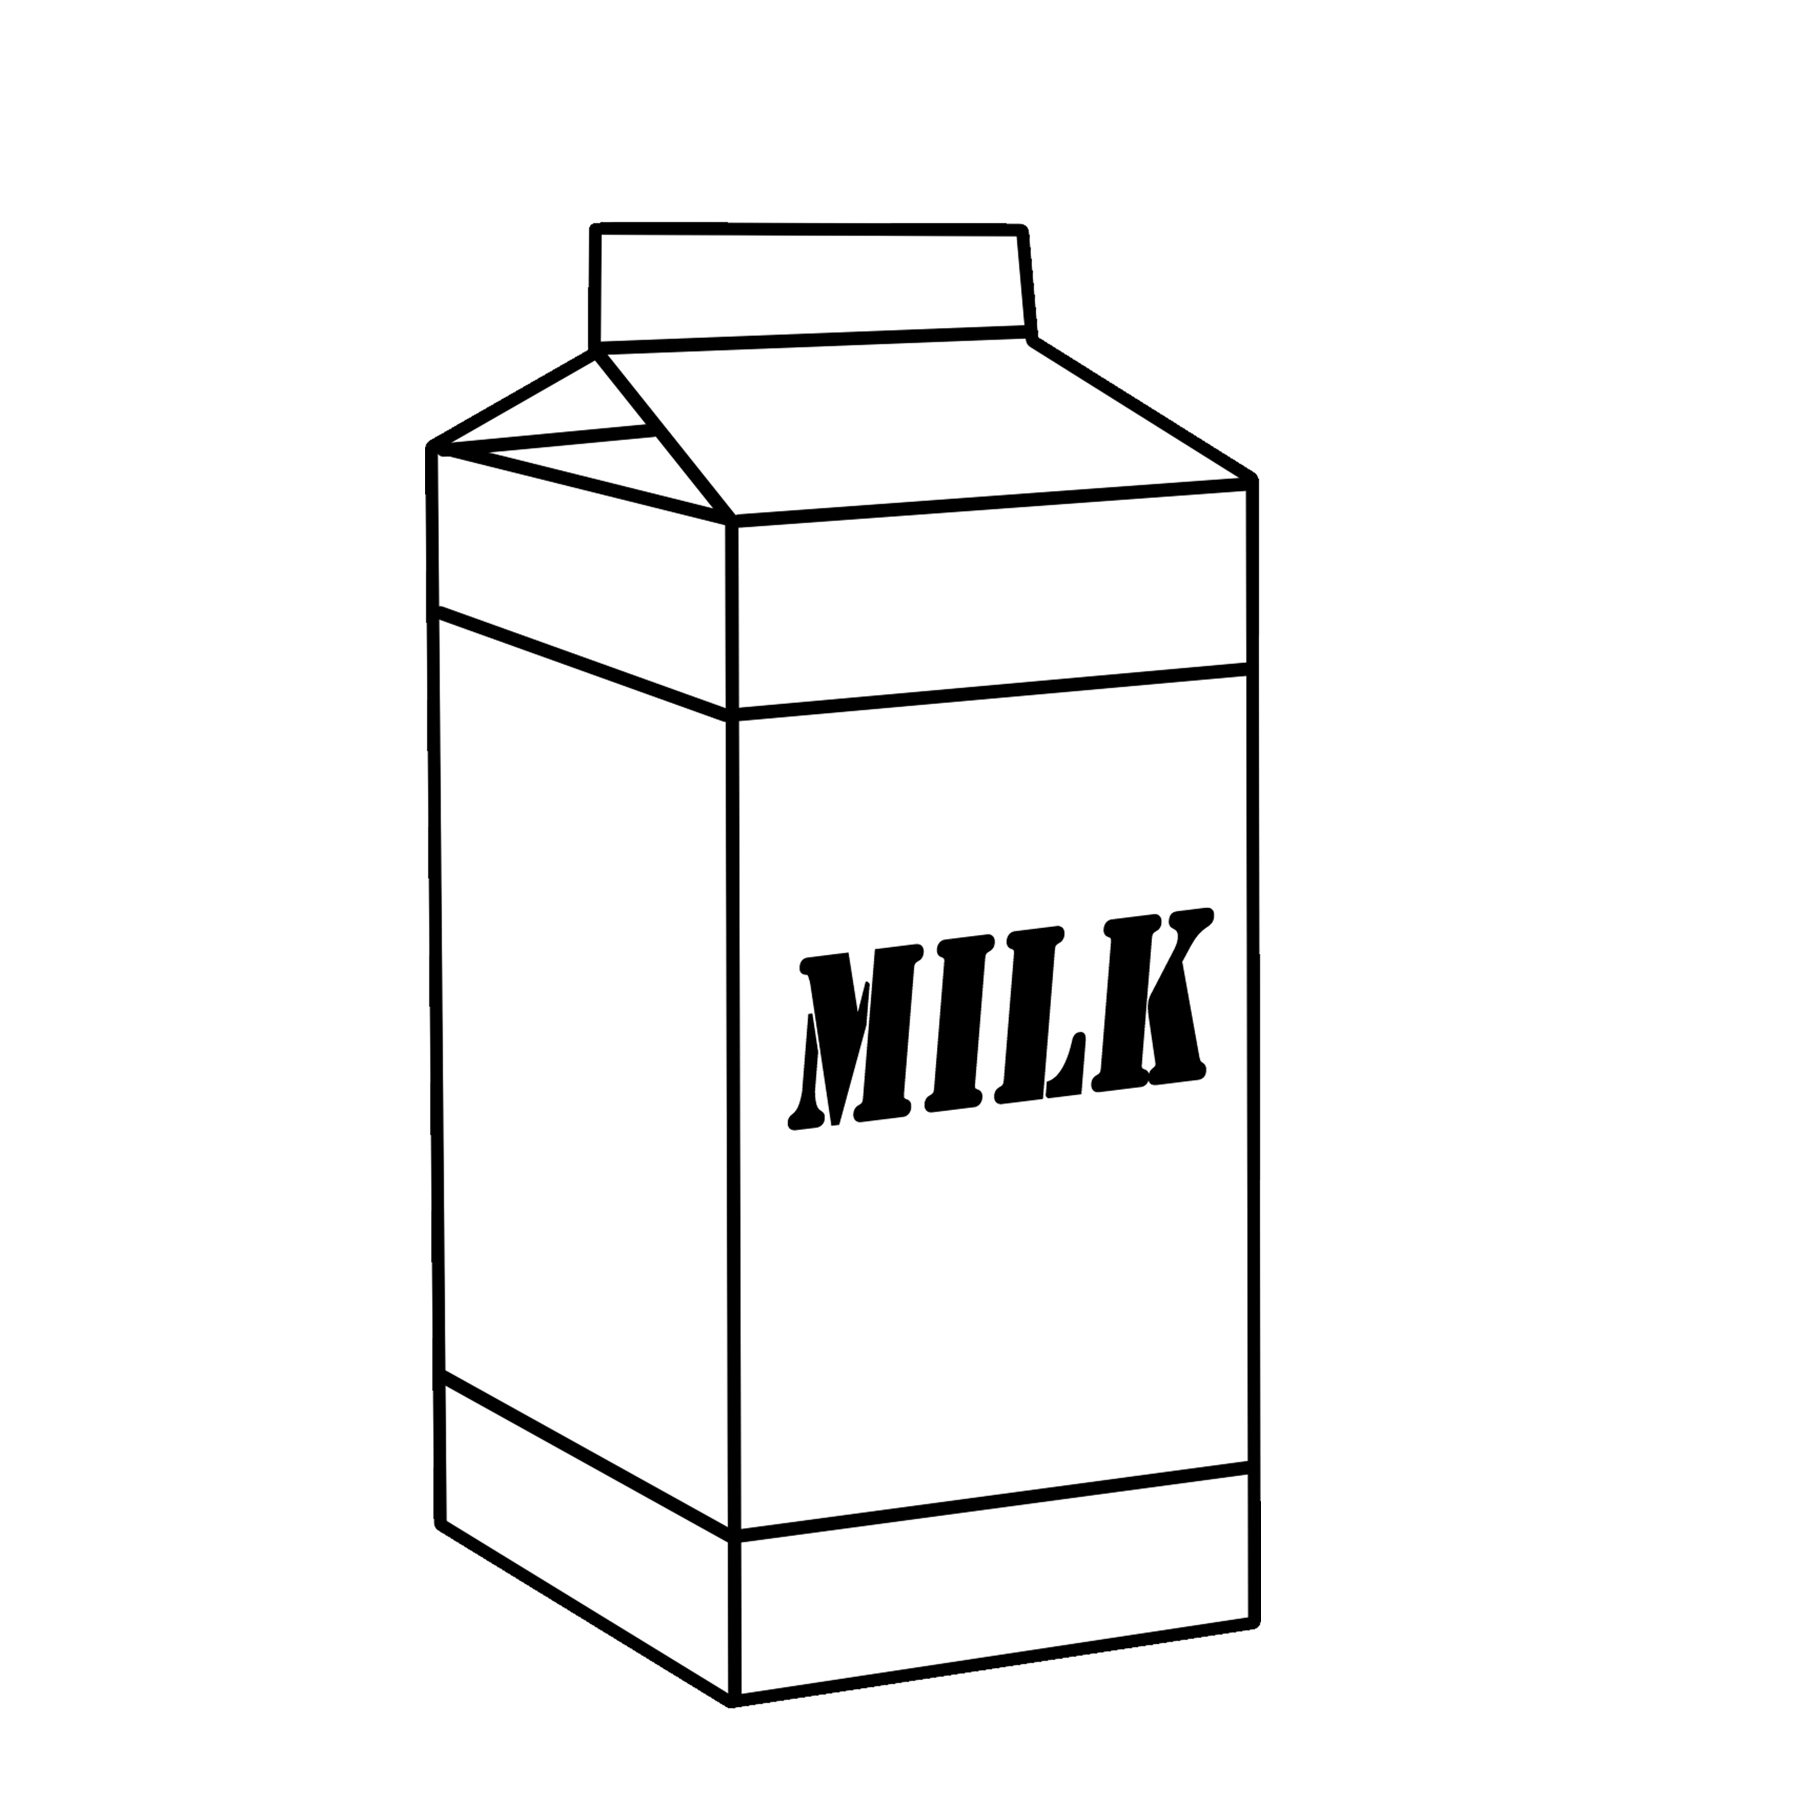 Milk Clipart Dairy Graphics.